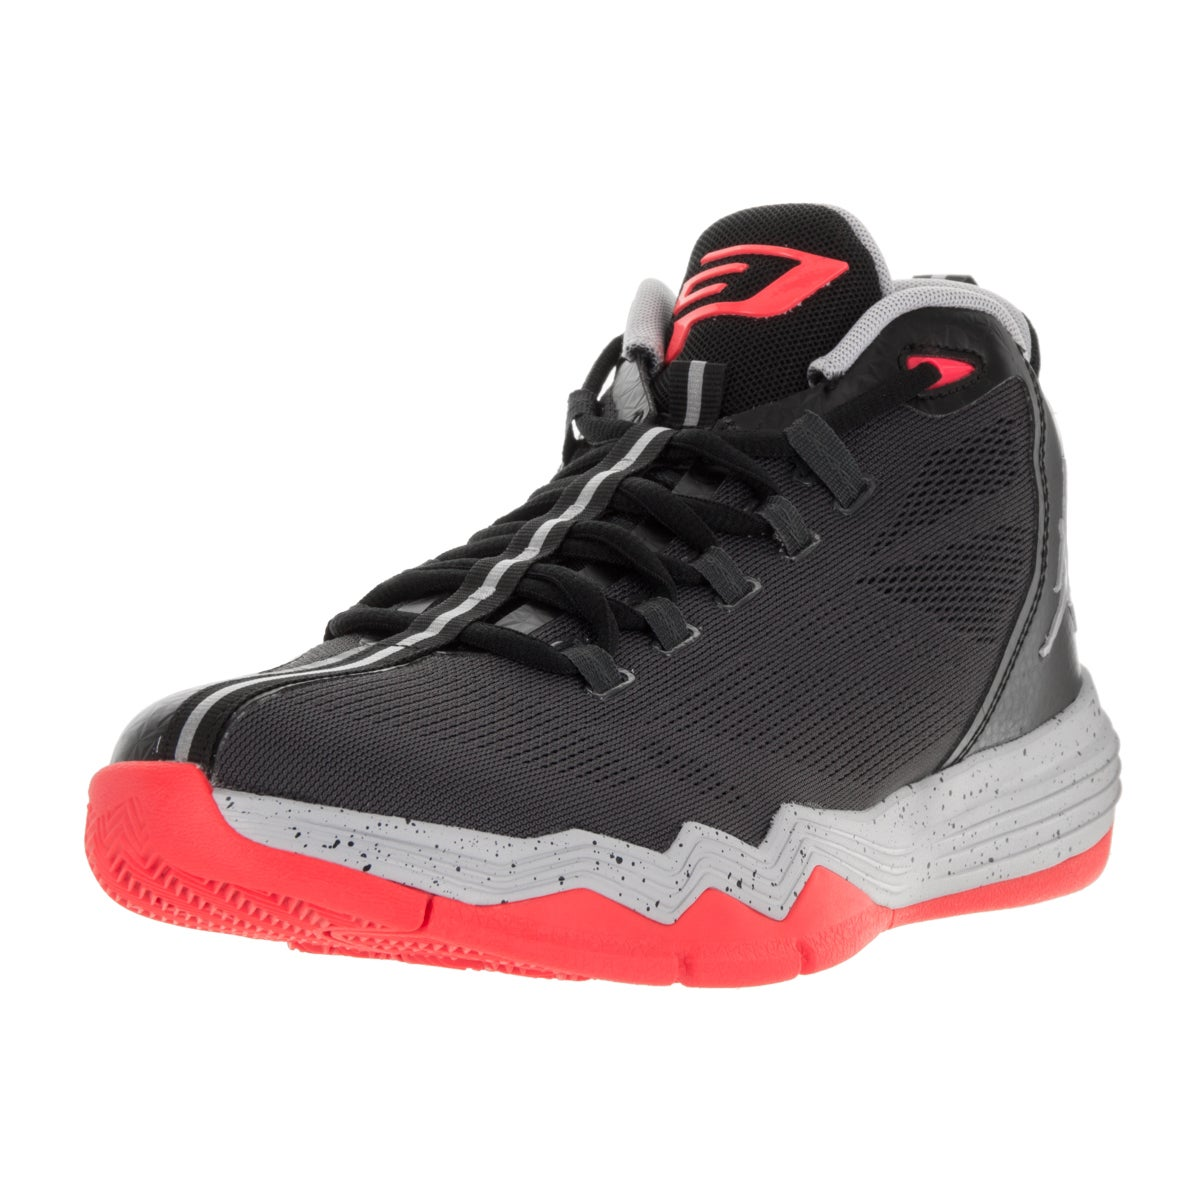 Nike Jordan Men's Jordan CP3.IX AE Anthrct/Wlf Gry/Blck/I...